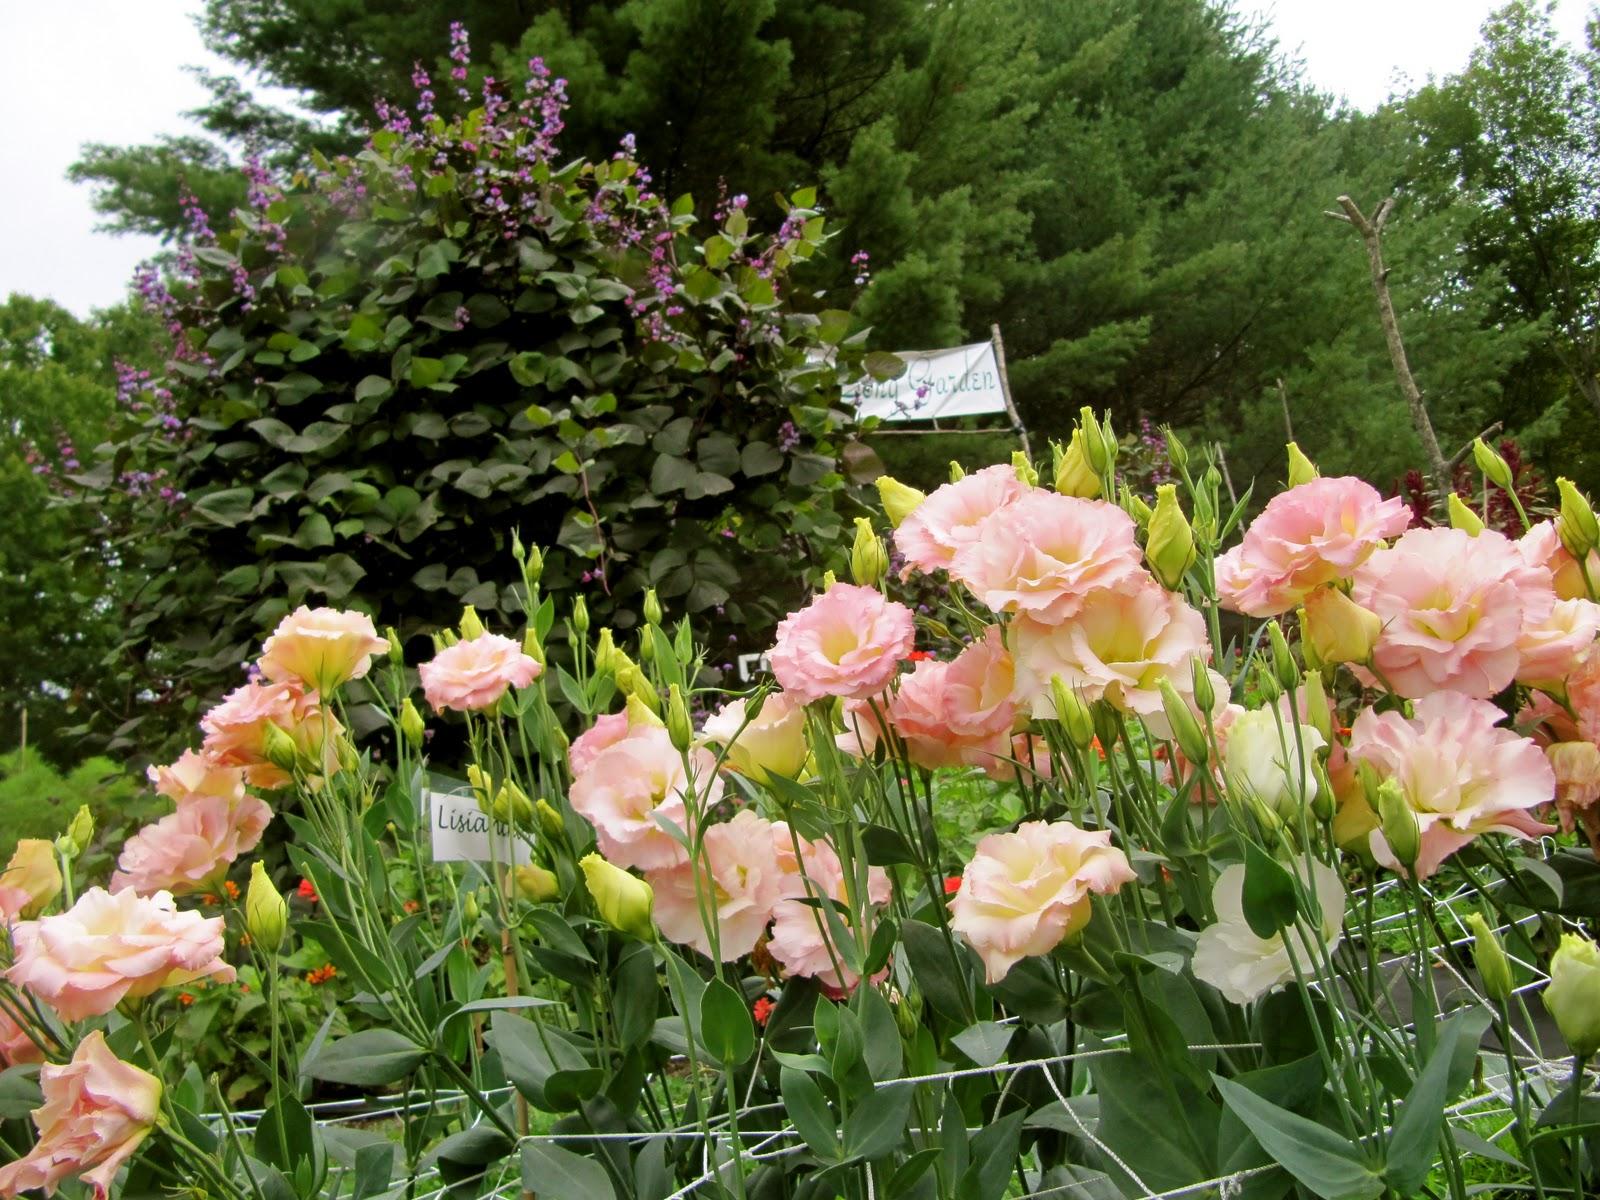 Backyard Flower Farmer : The Song Garden Flower Farm and Tea House of Cornish, NH  February